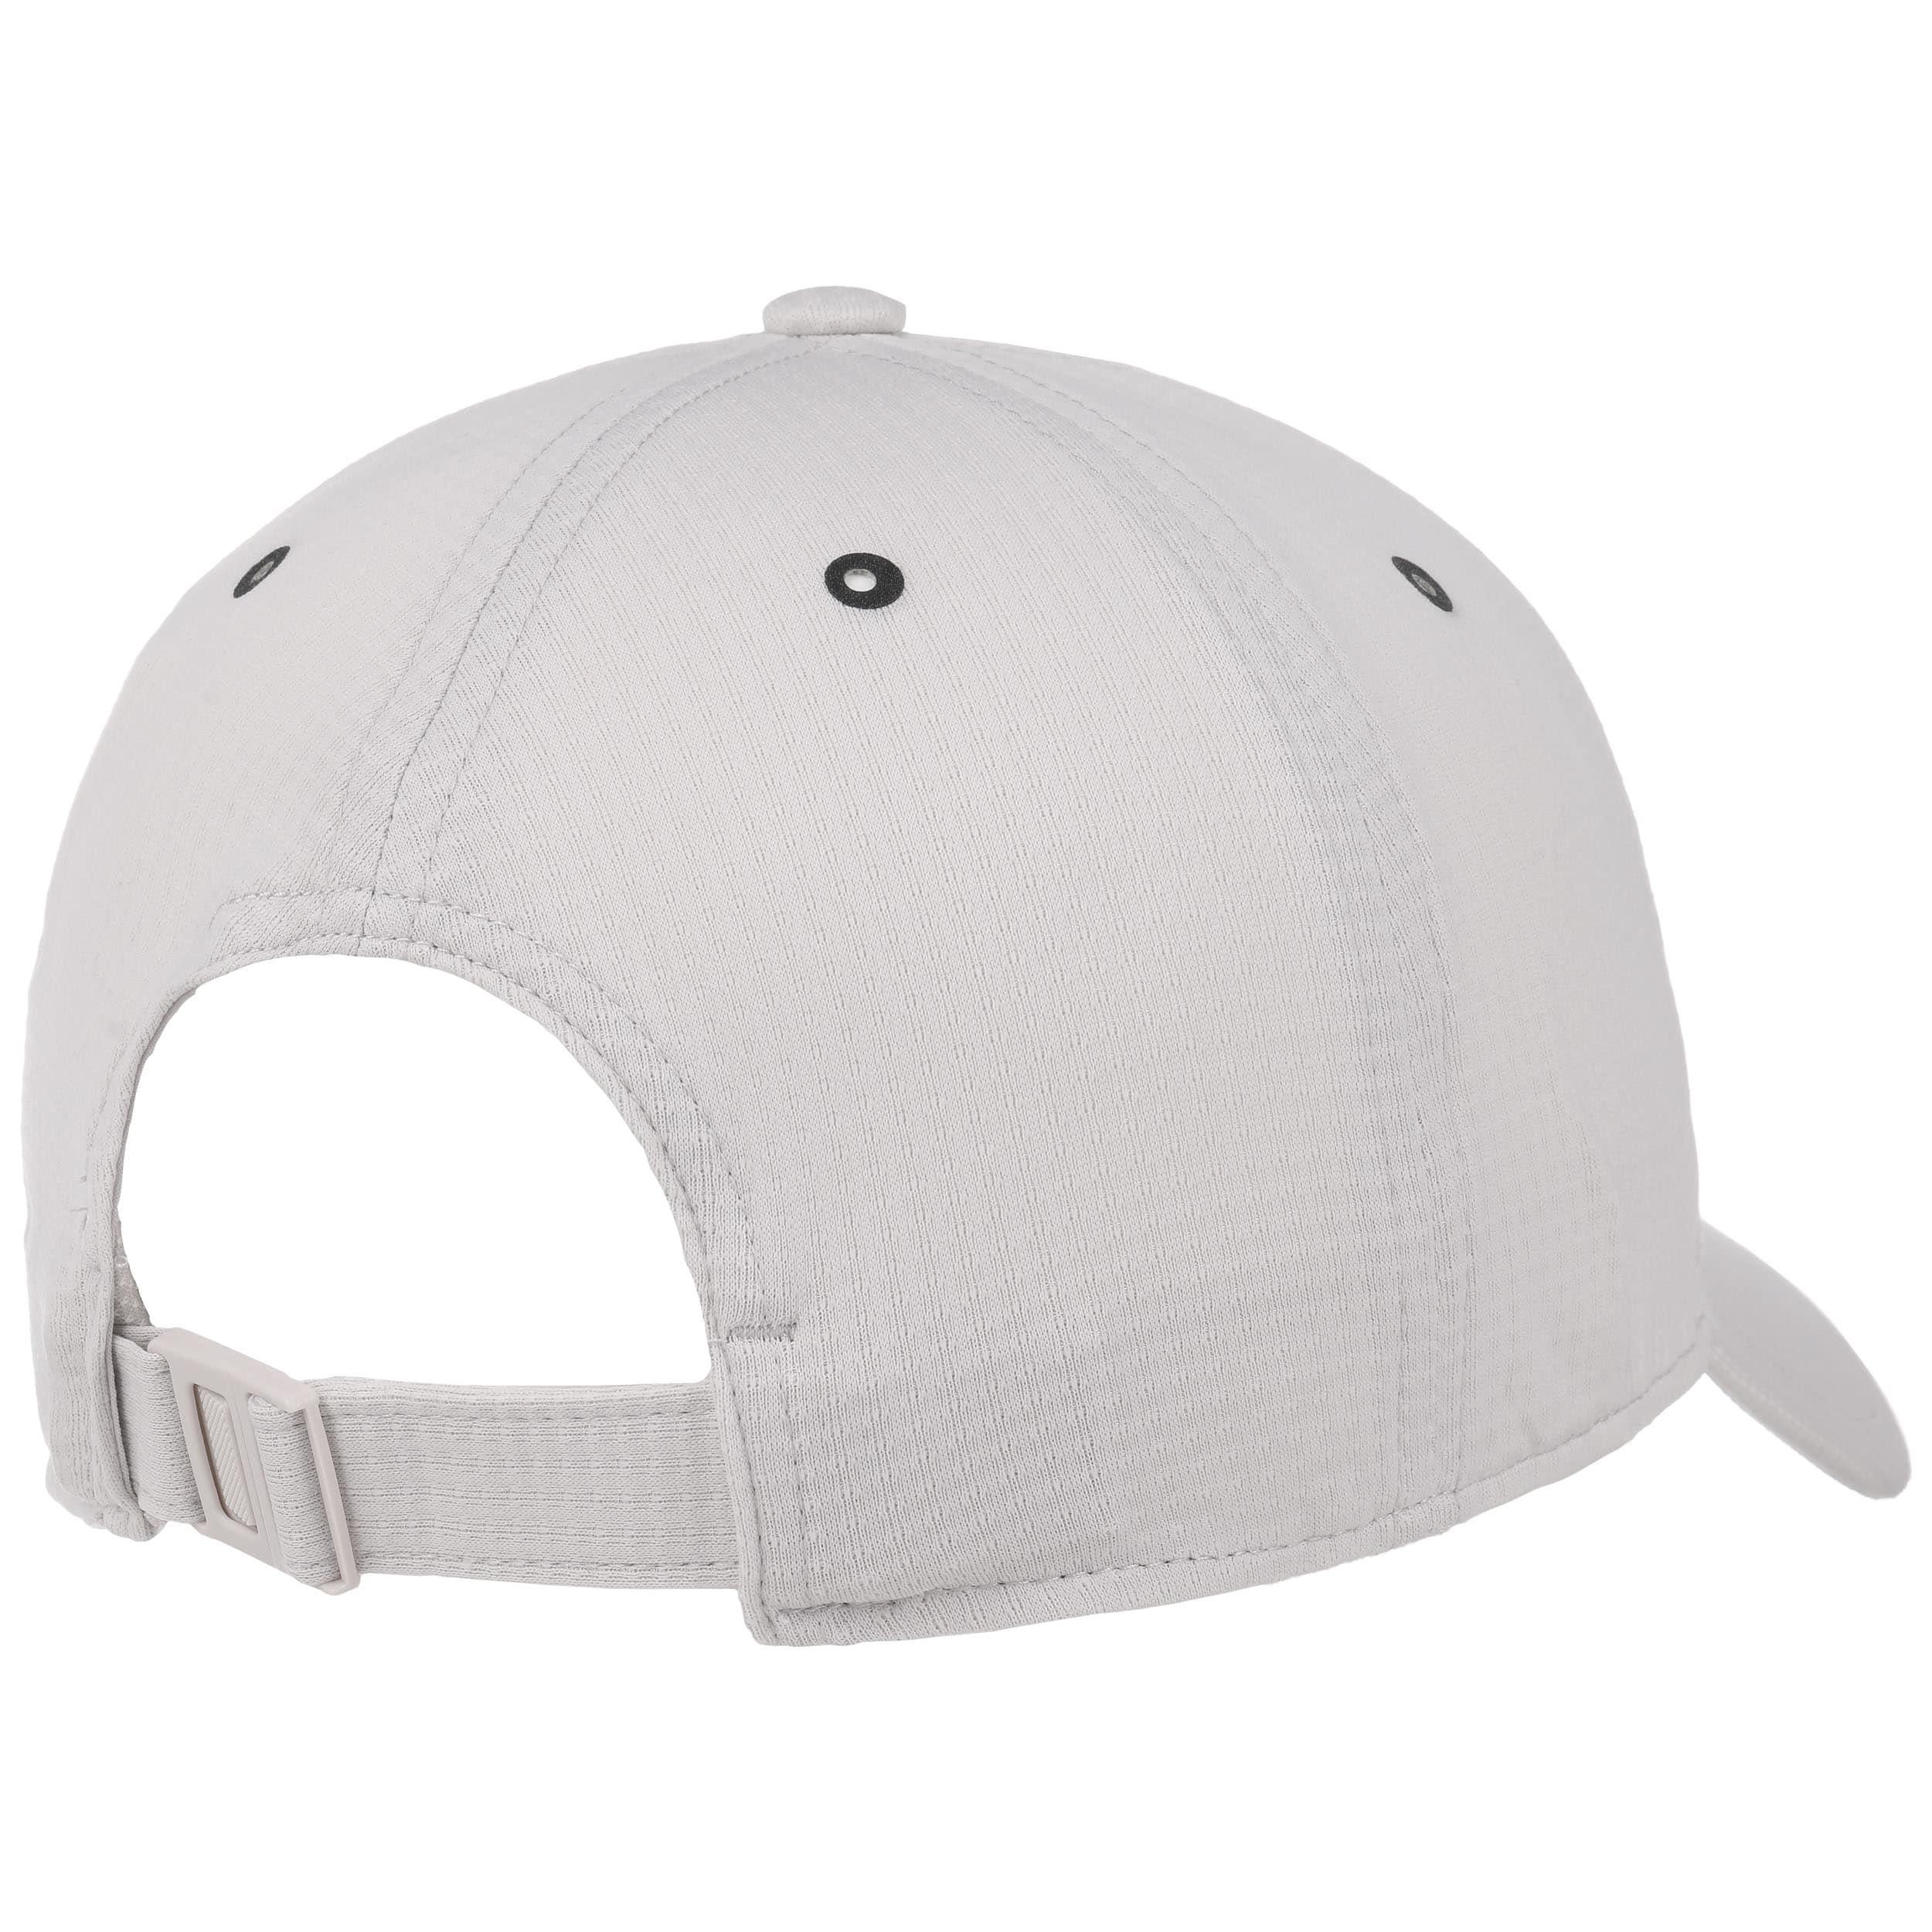 Adidas climachill bianco